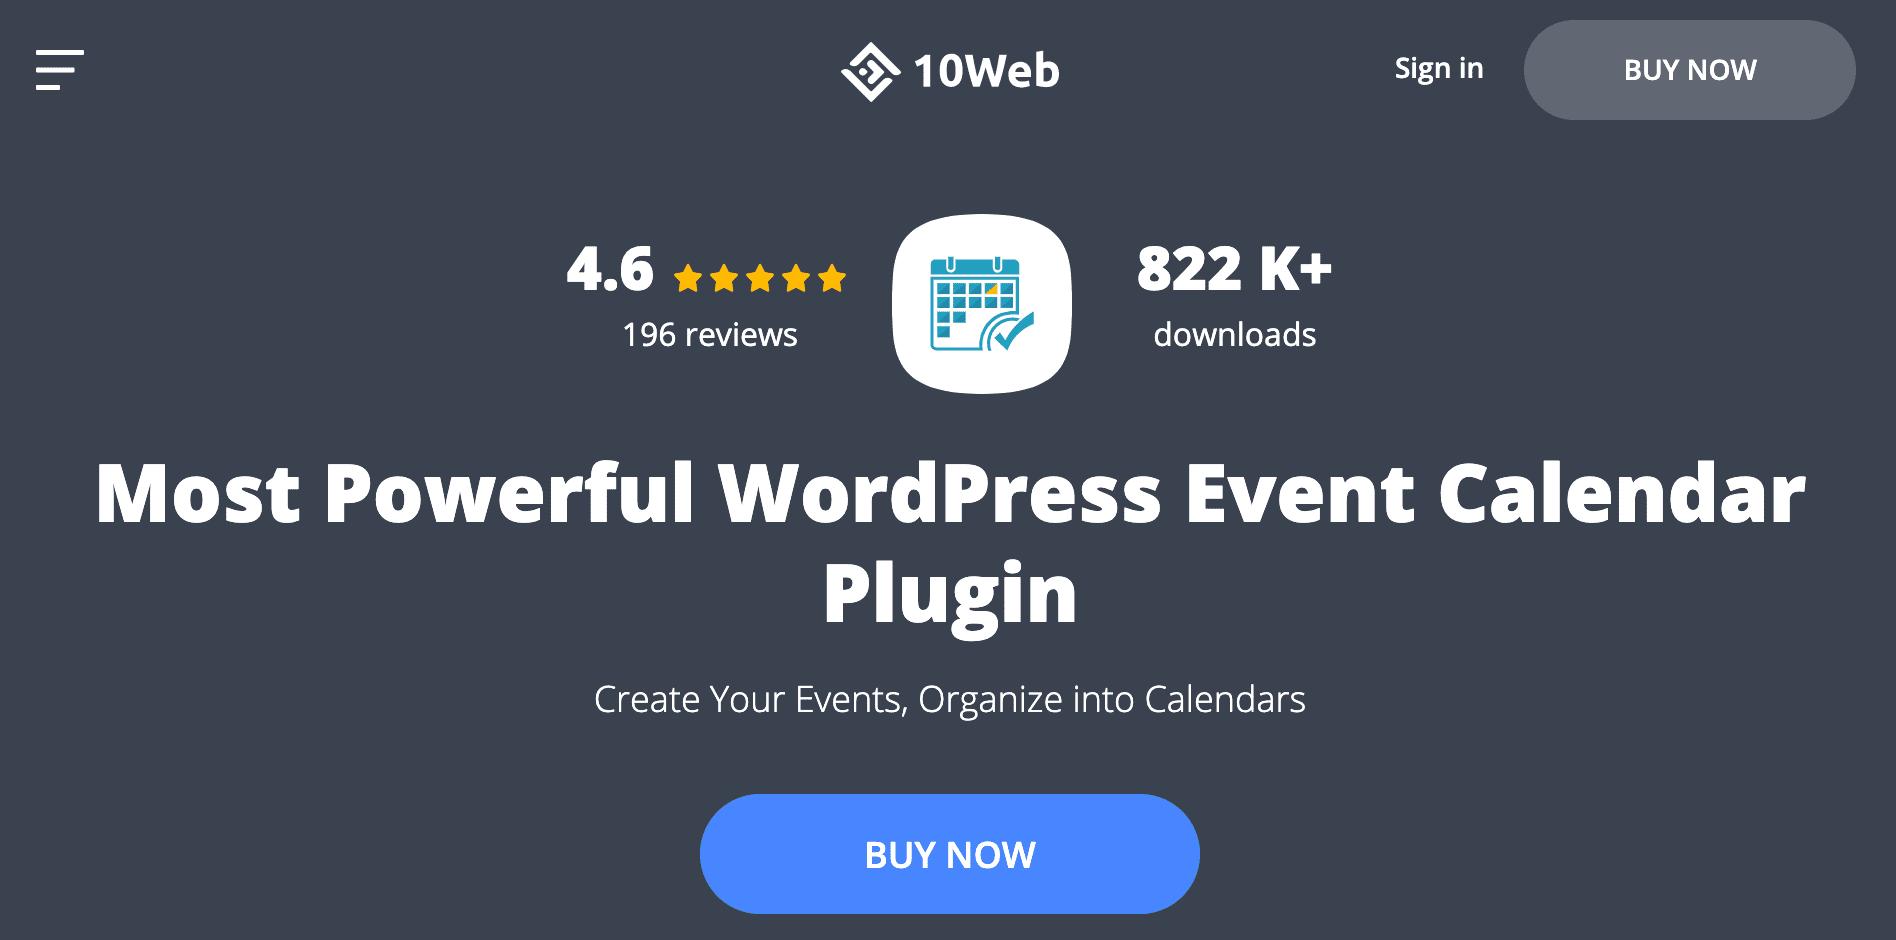 10web plugin